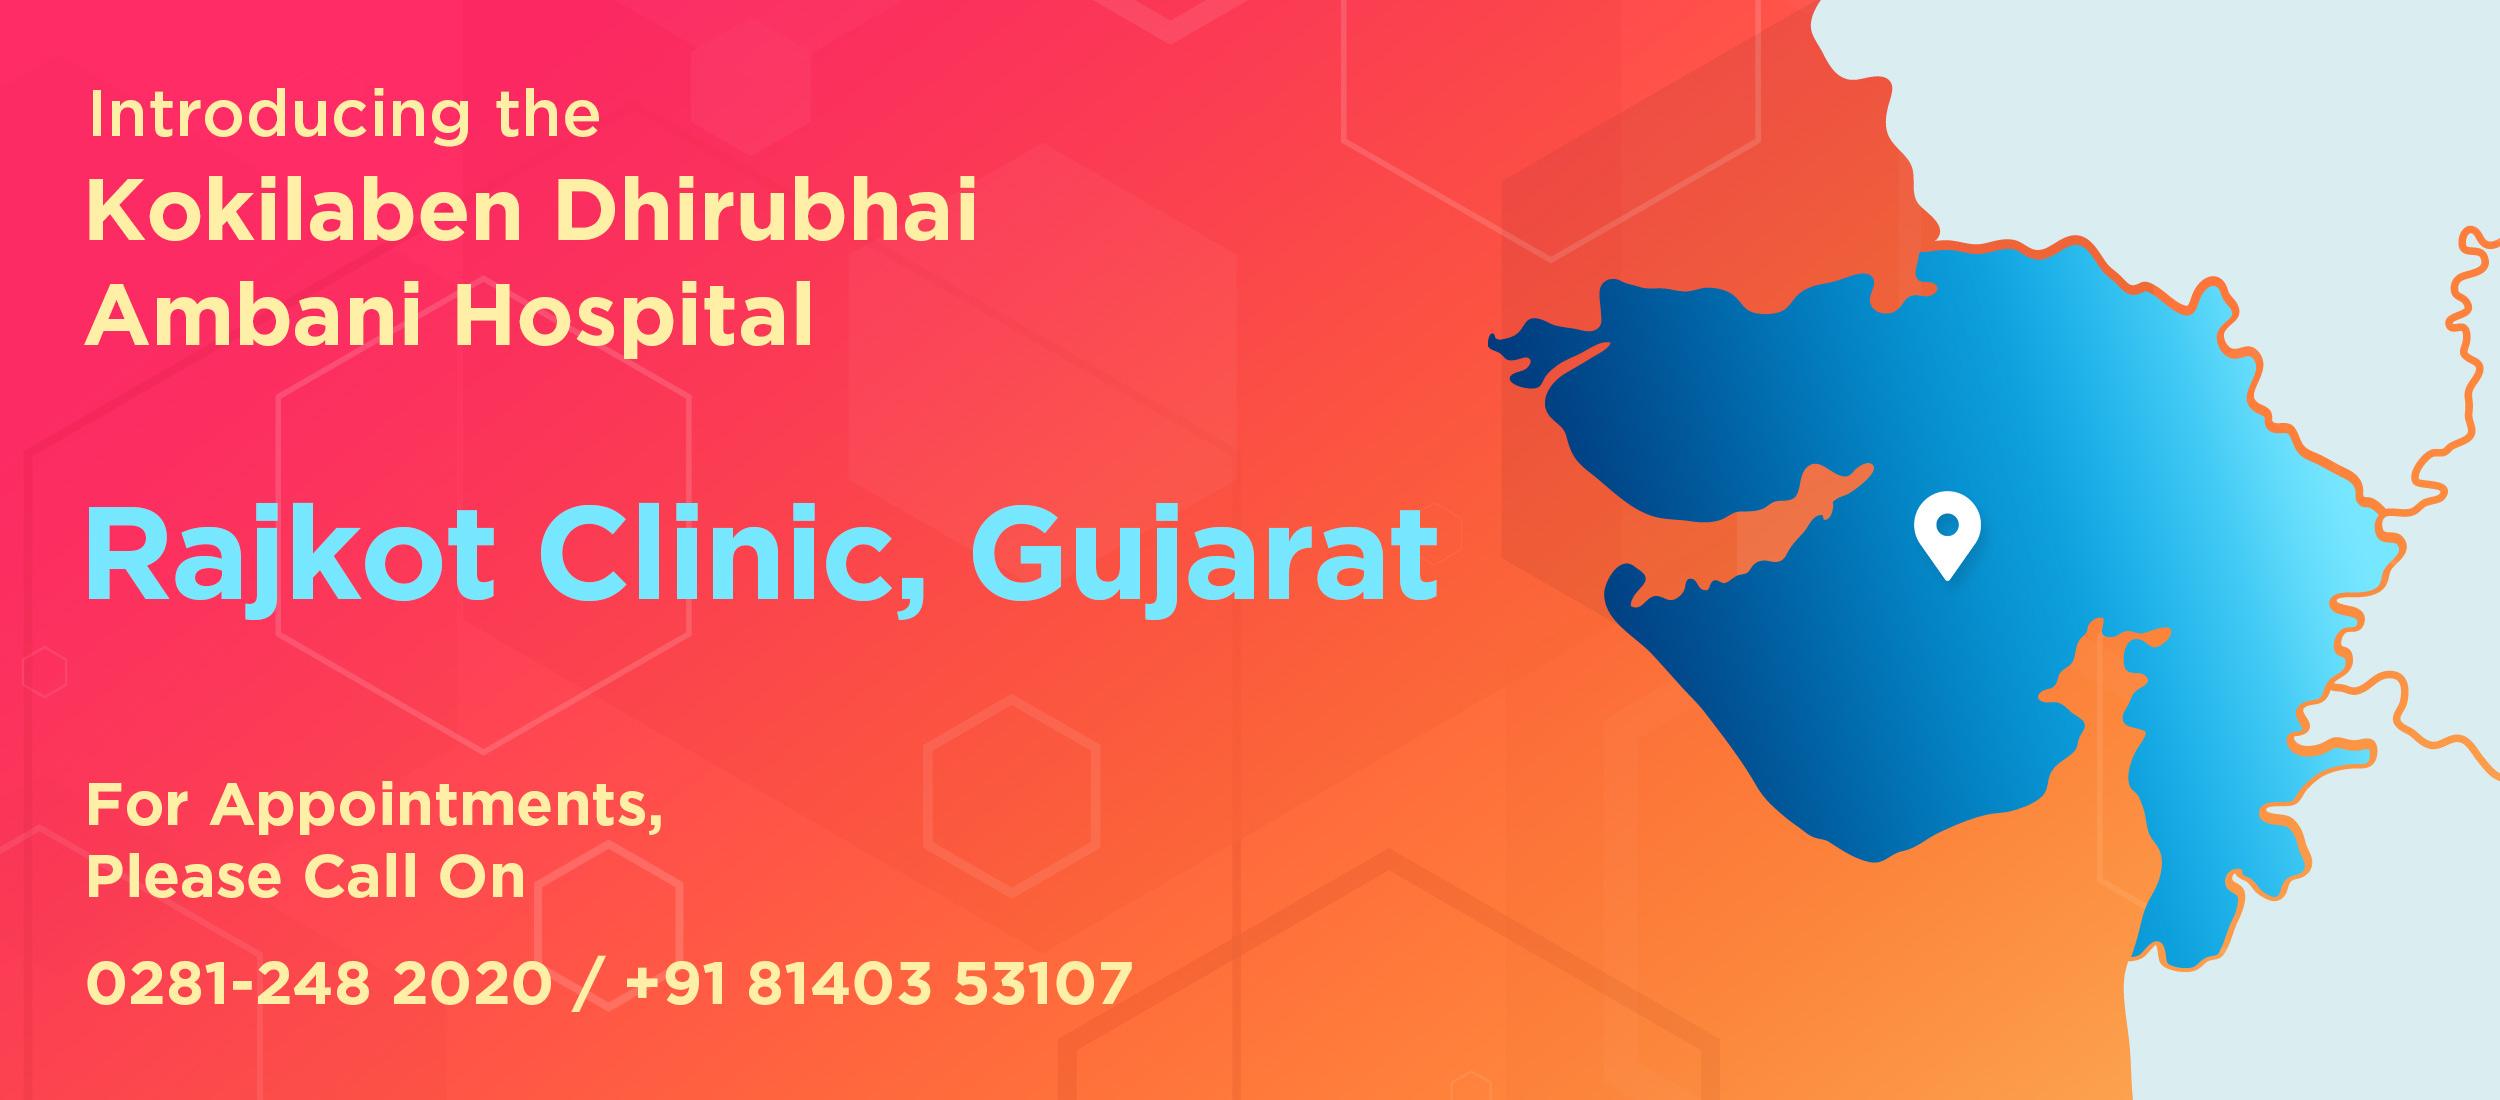 Kokilaben Dhirubhai Ambani Hospital - Rajkot Clinic, Gujarat